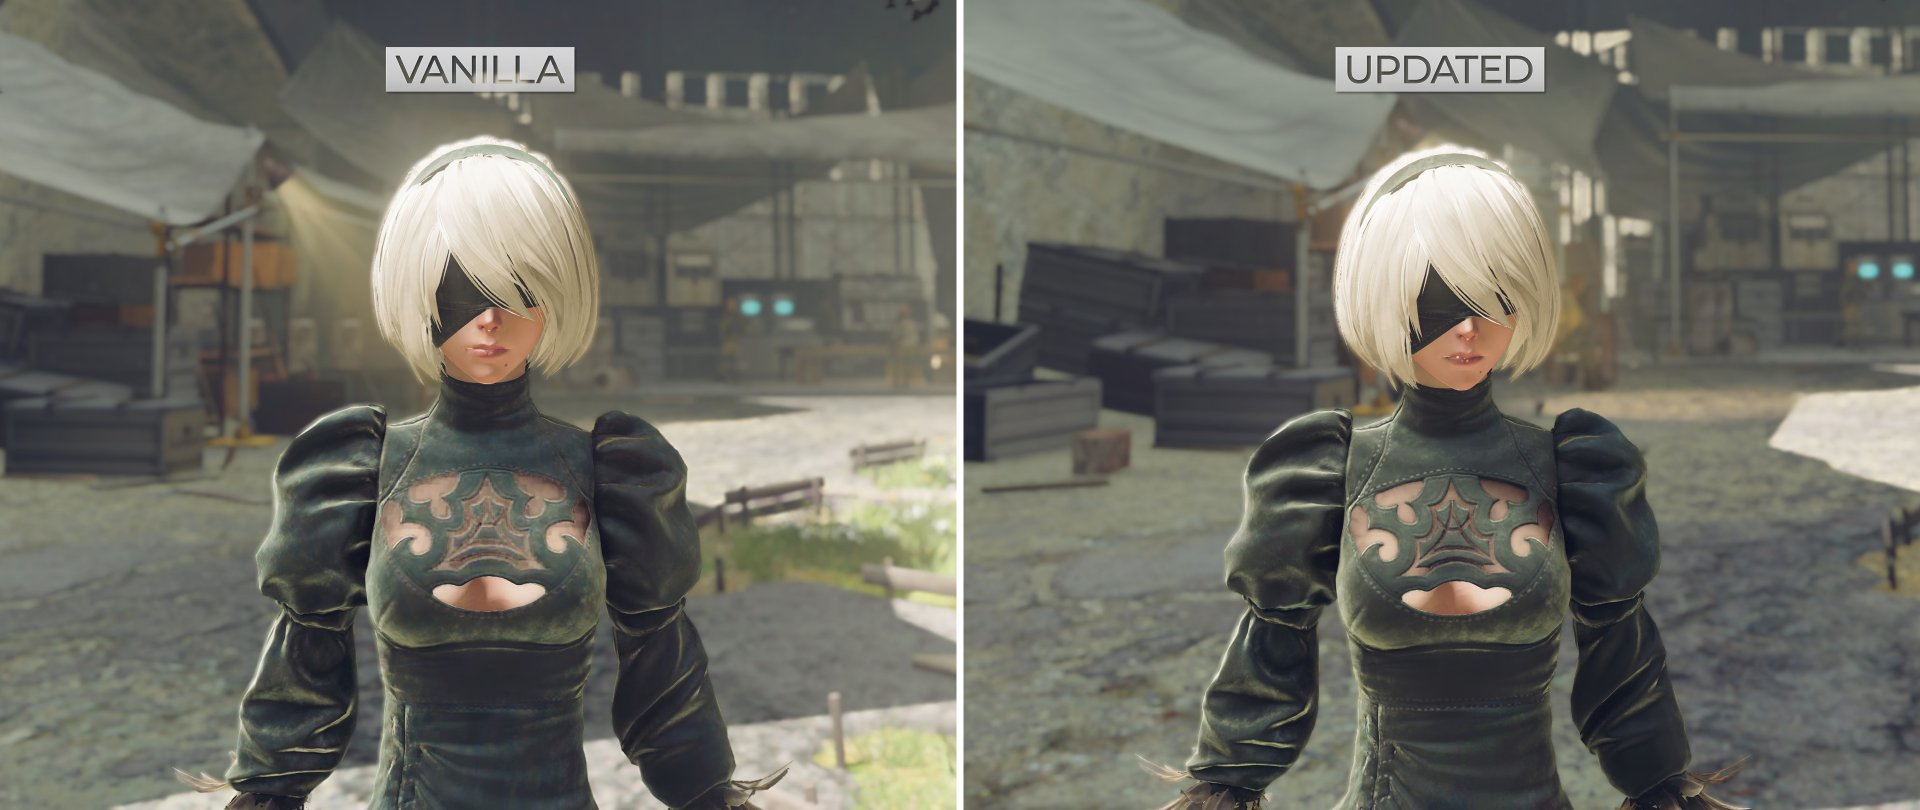 NieR Automata HD Texture Pack comparison screenshots-1